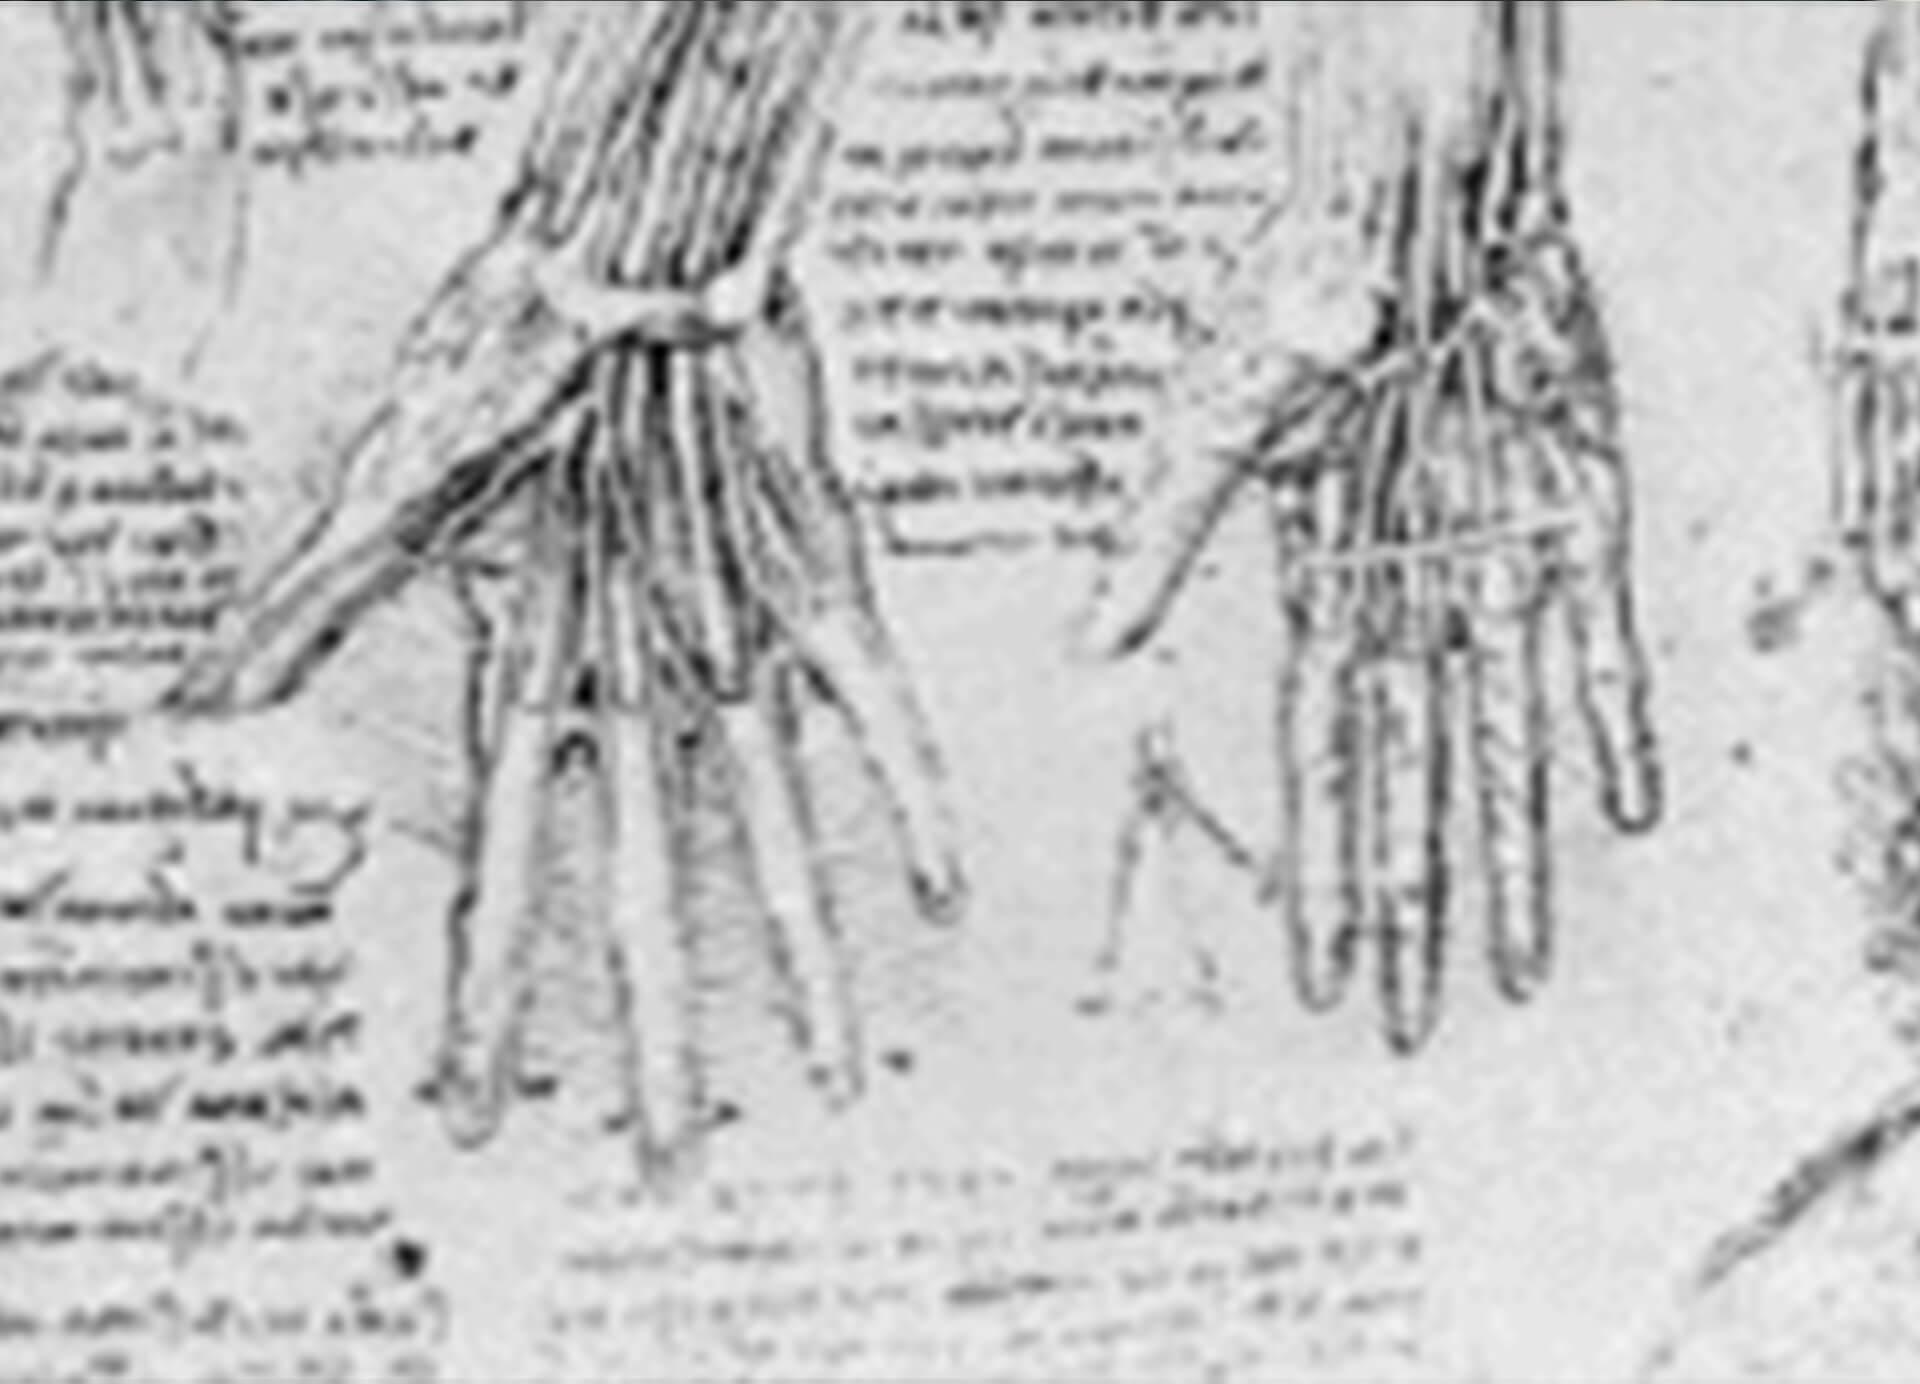 fingertip injuries img - Dr Cameron Mackay